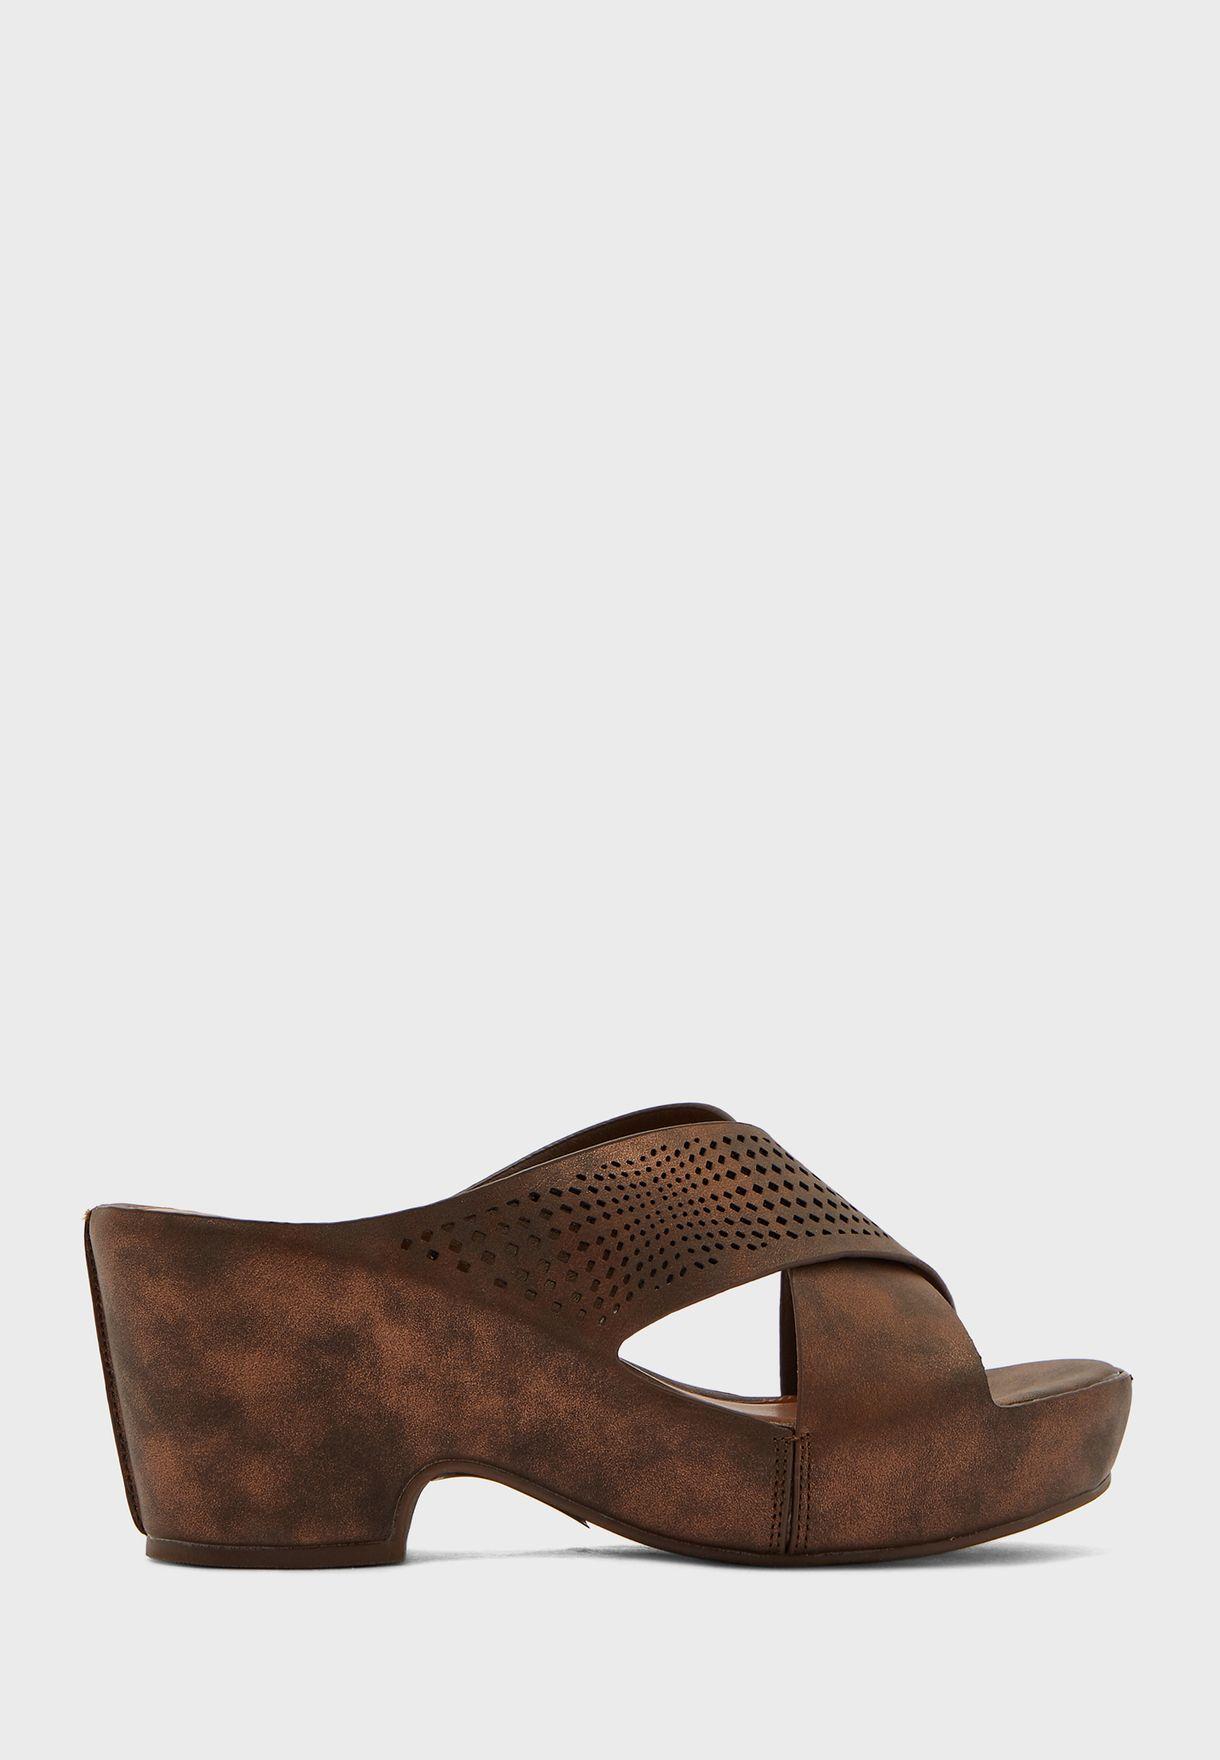 Perforated Strap High Heel Sandal